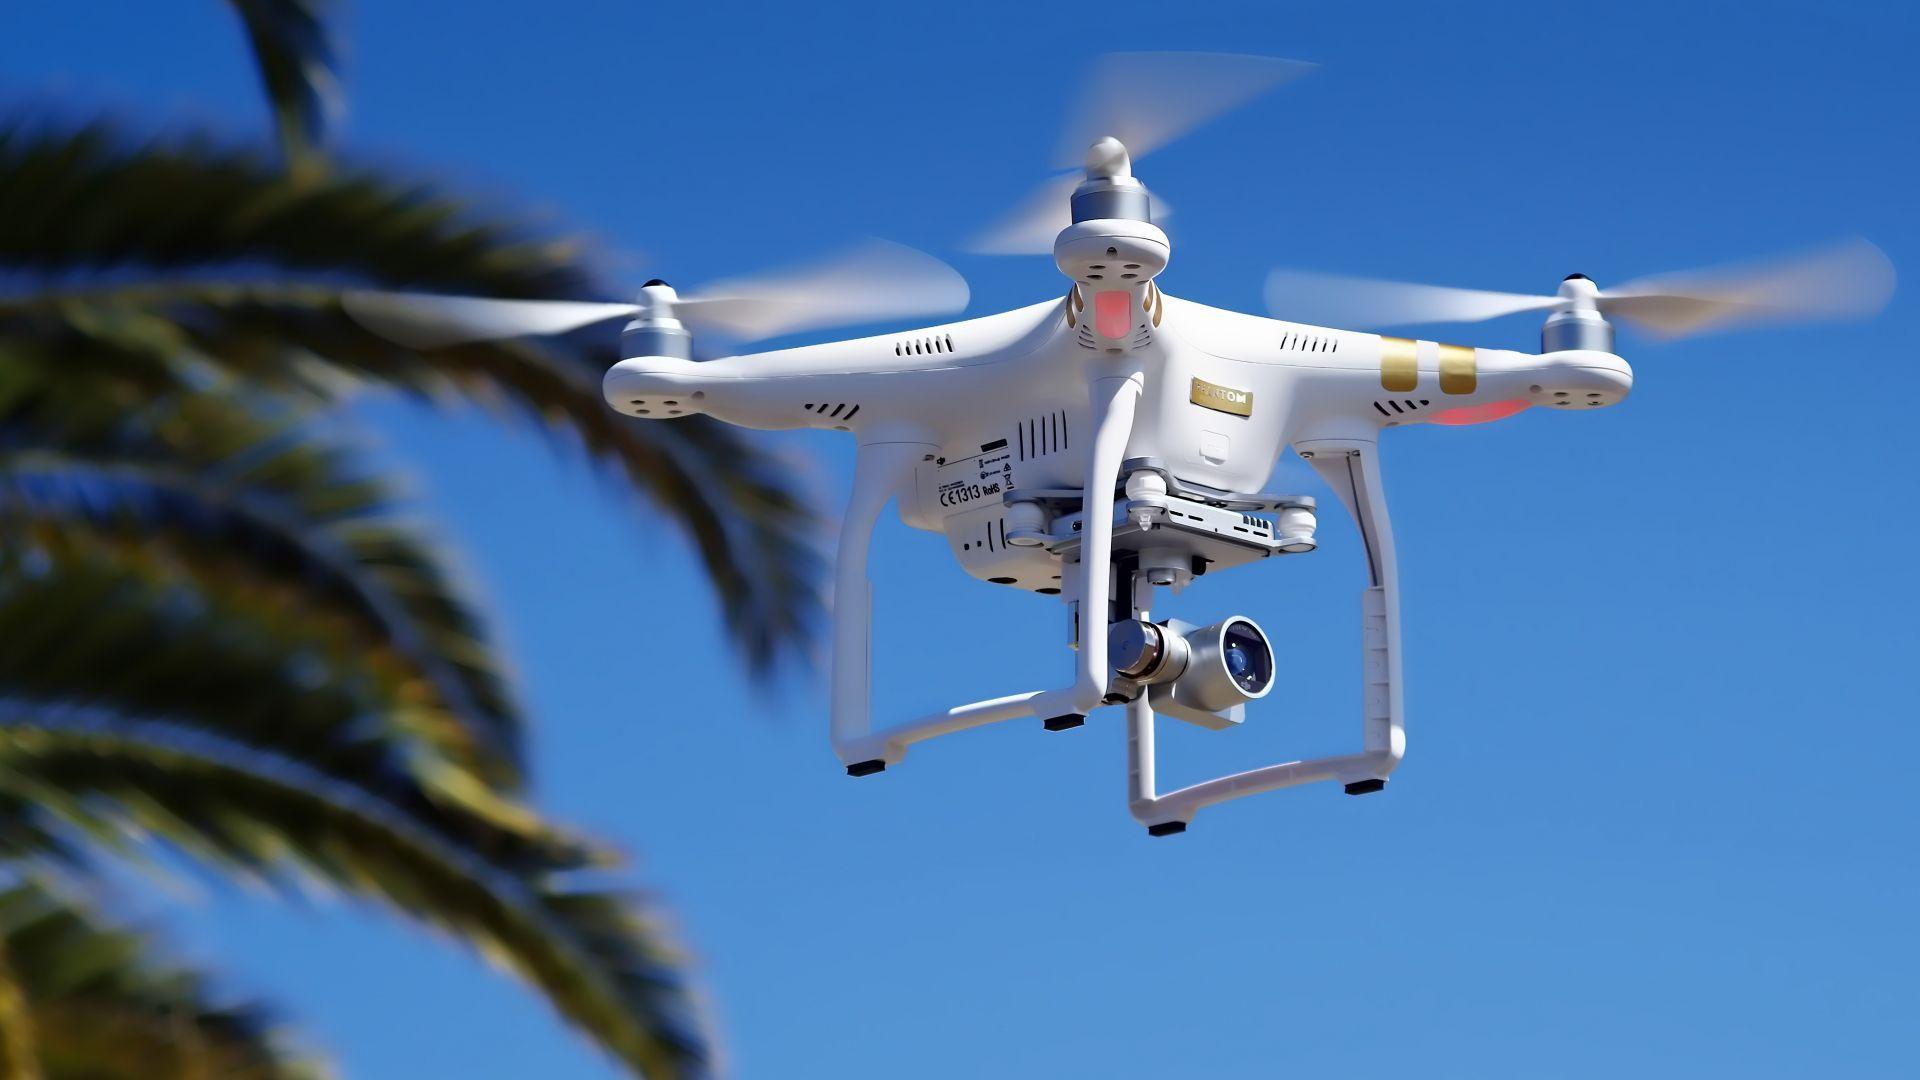 Drone Free Download Wallpaper